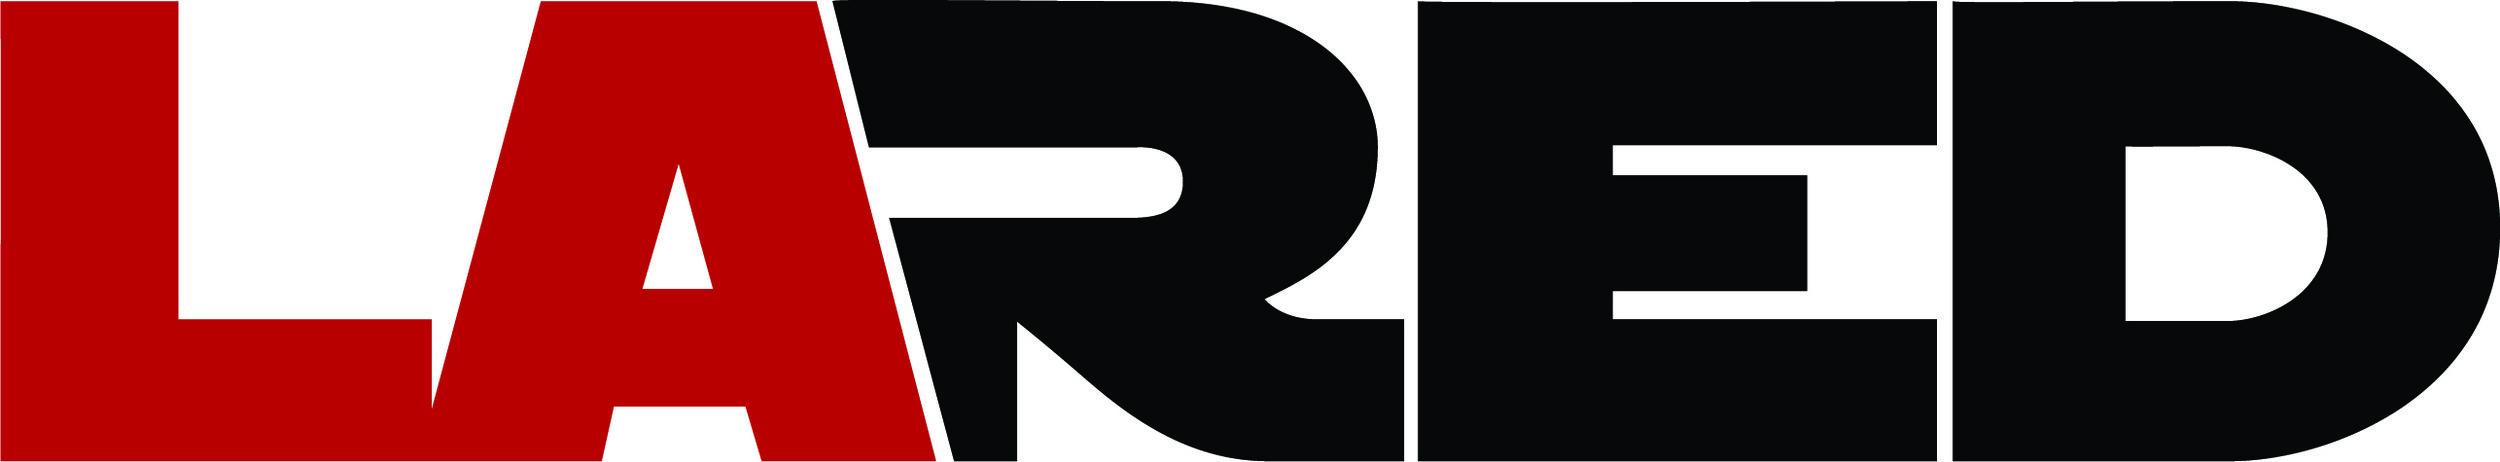 lared-logo1.jpg